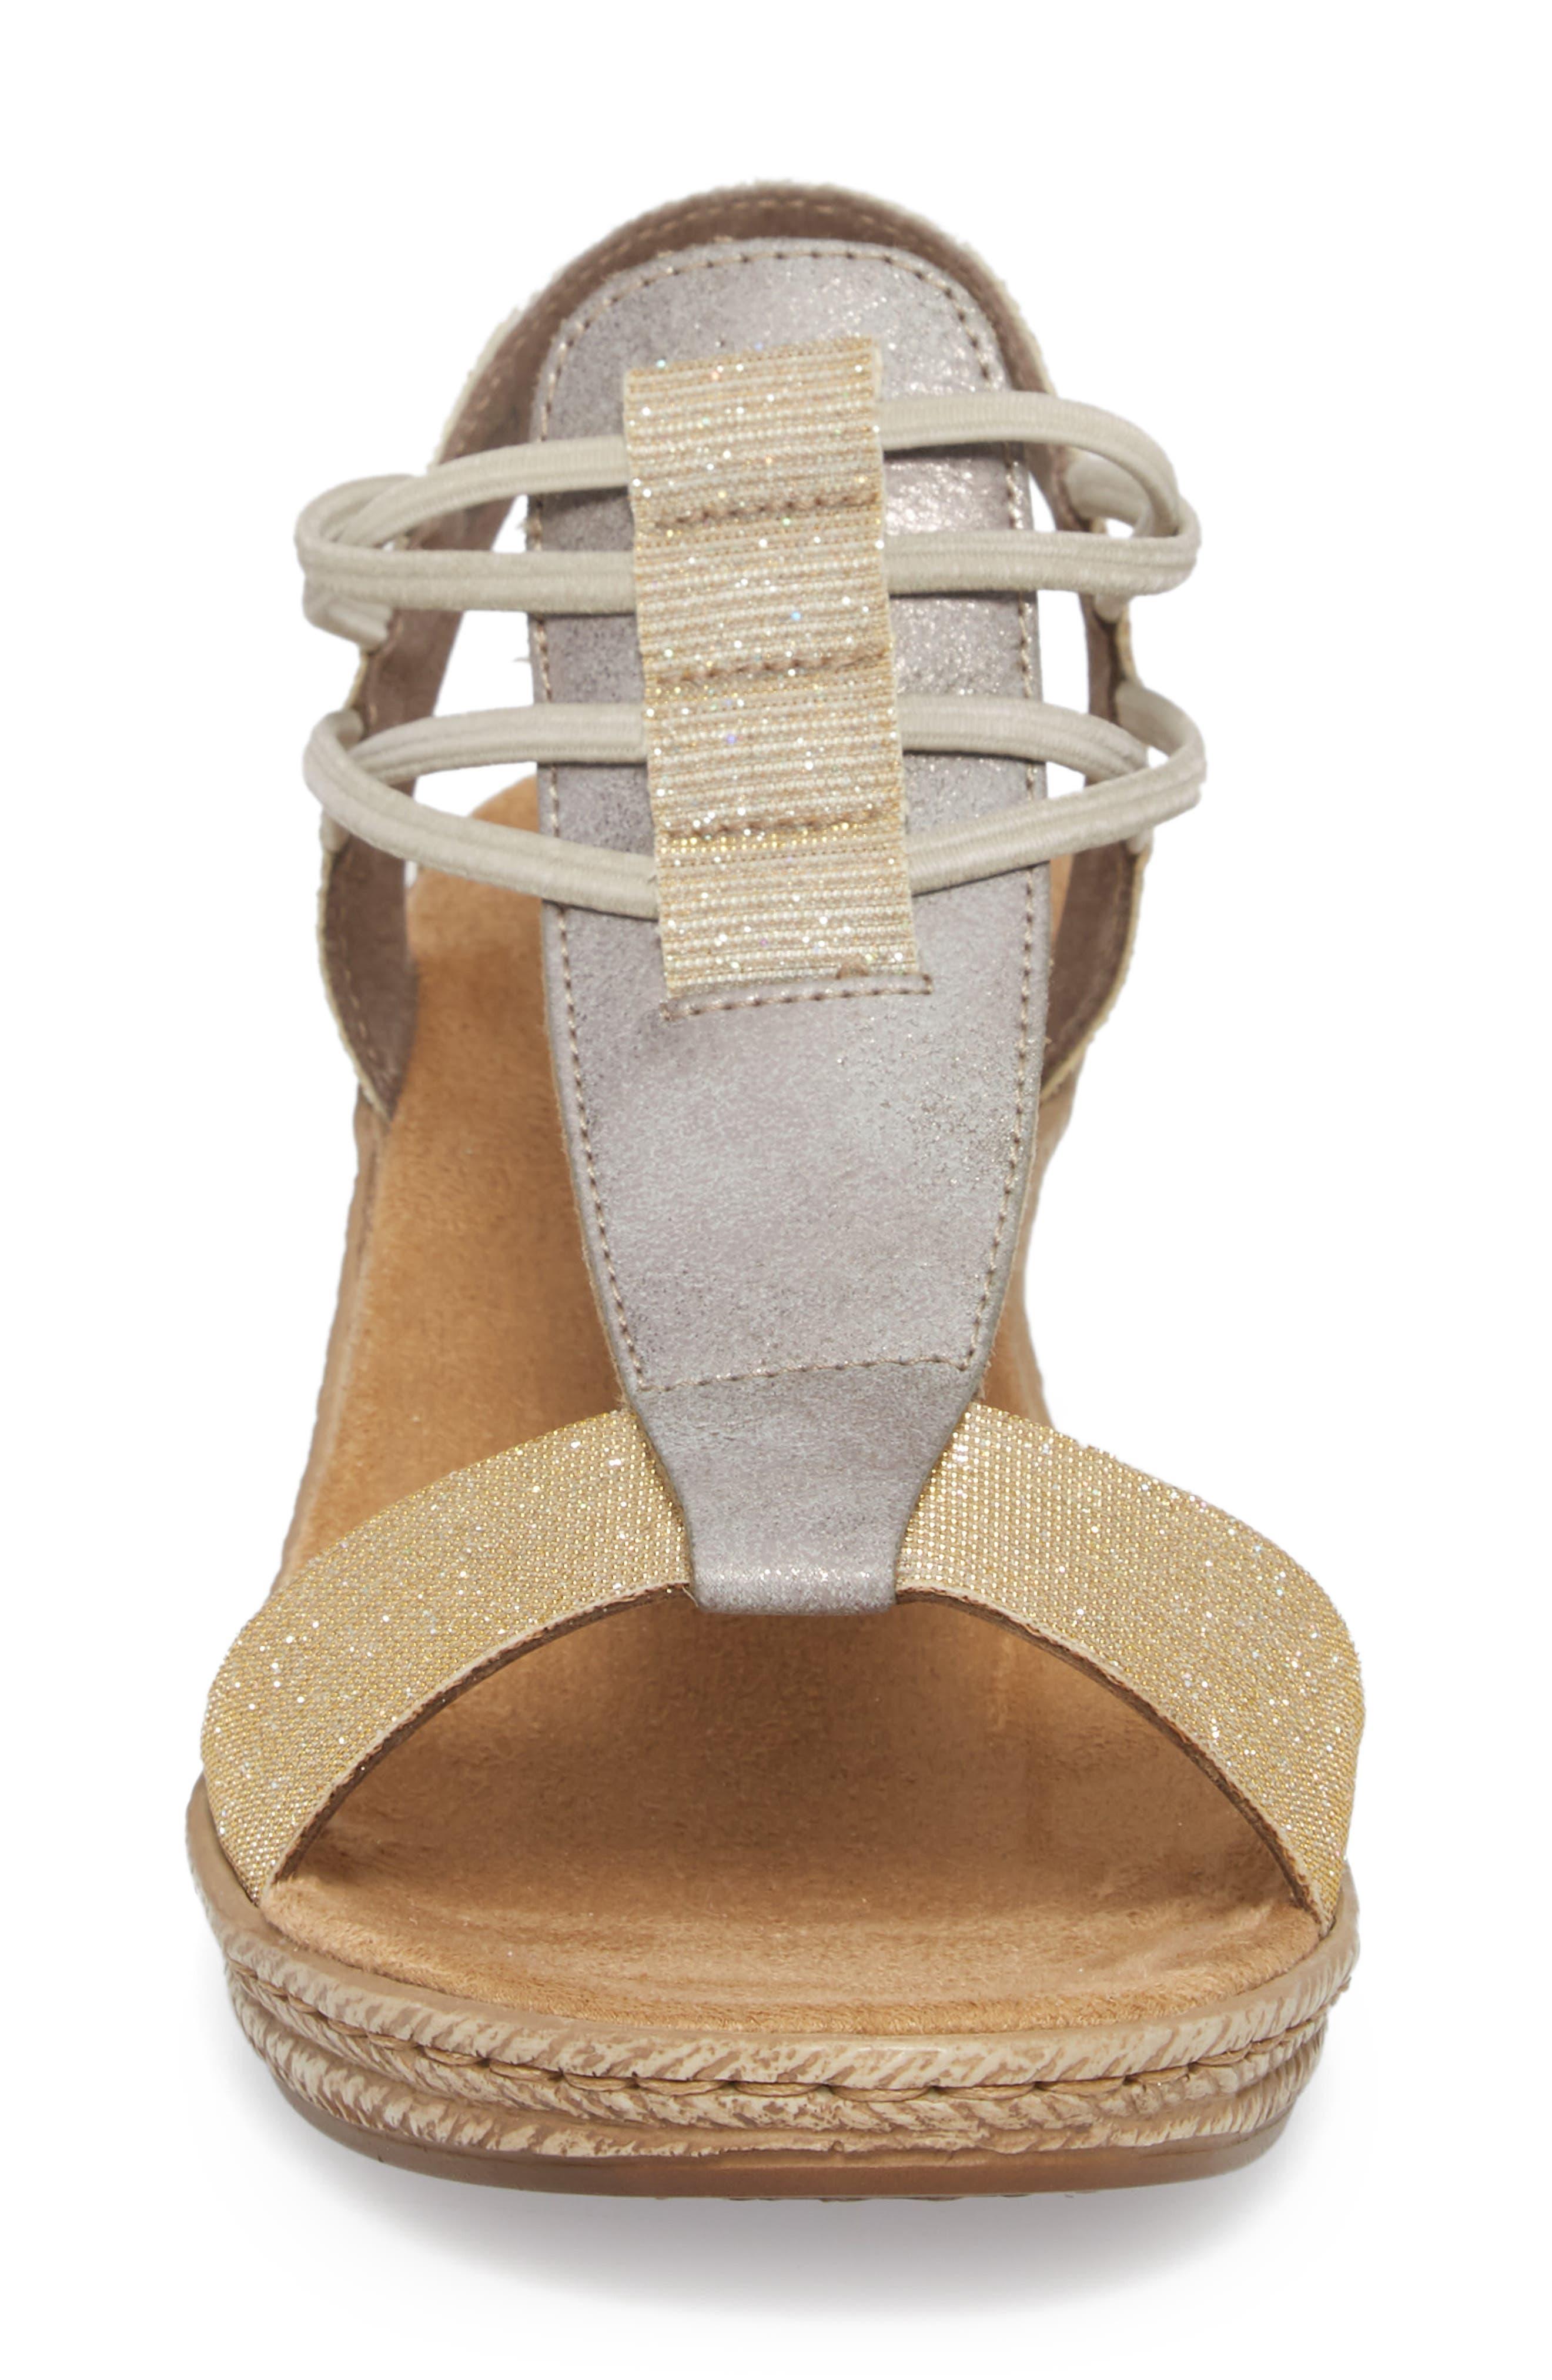 ,                             Fanni 22 Espadrille Wedge Sandal,                             Alternate thumbnail 4, color,                             LIGHT GOLD/ GREY FABRIC